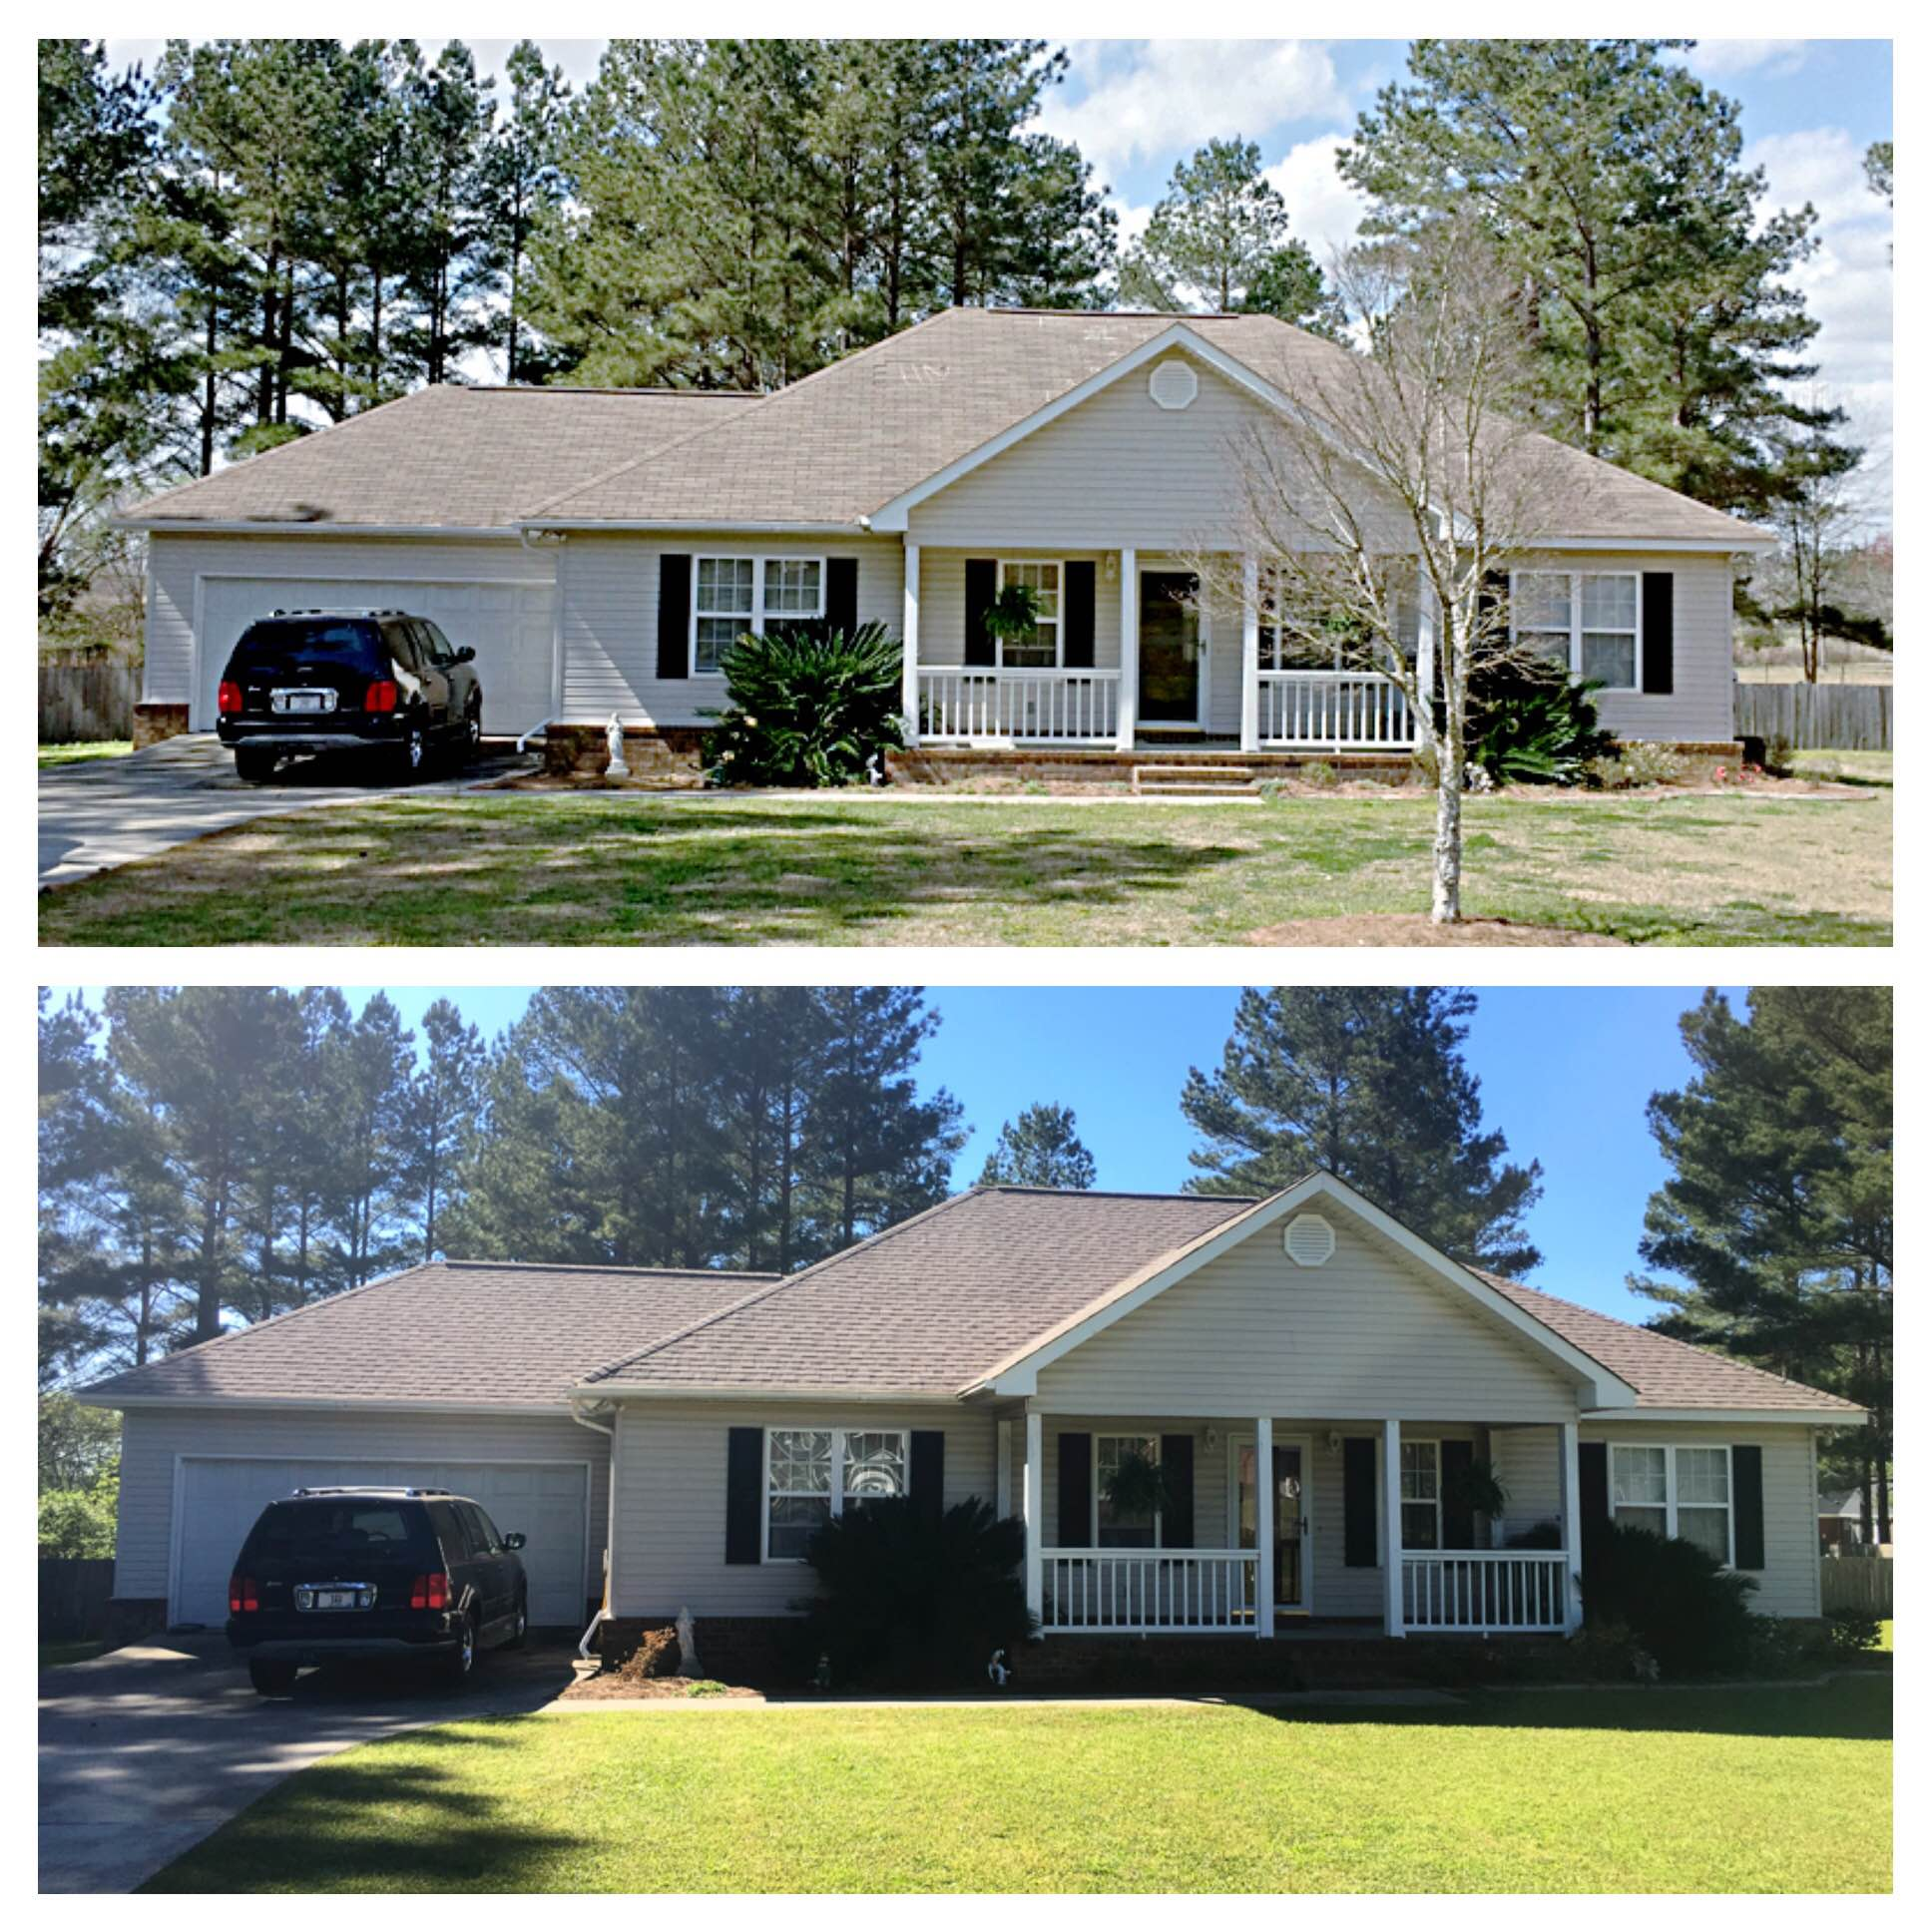 residential roofing contractors roofonline part 5. Black Bedroom Furniture Sets. Home Design Ideas